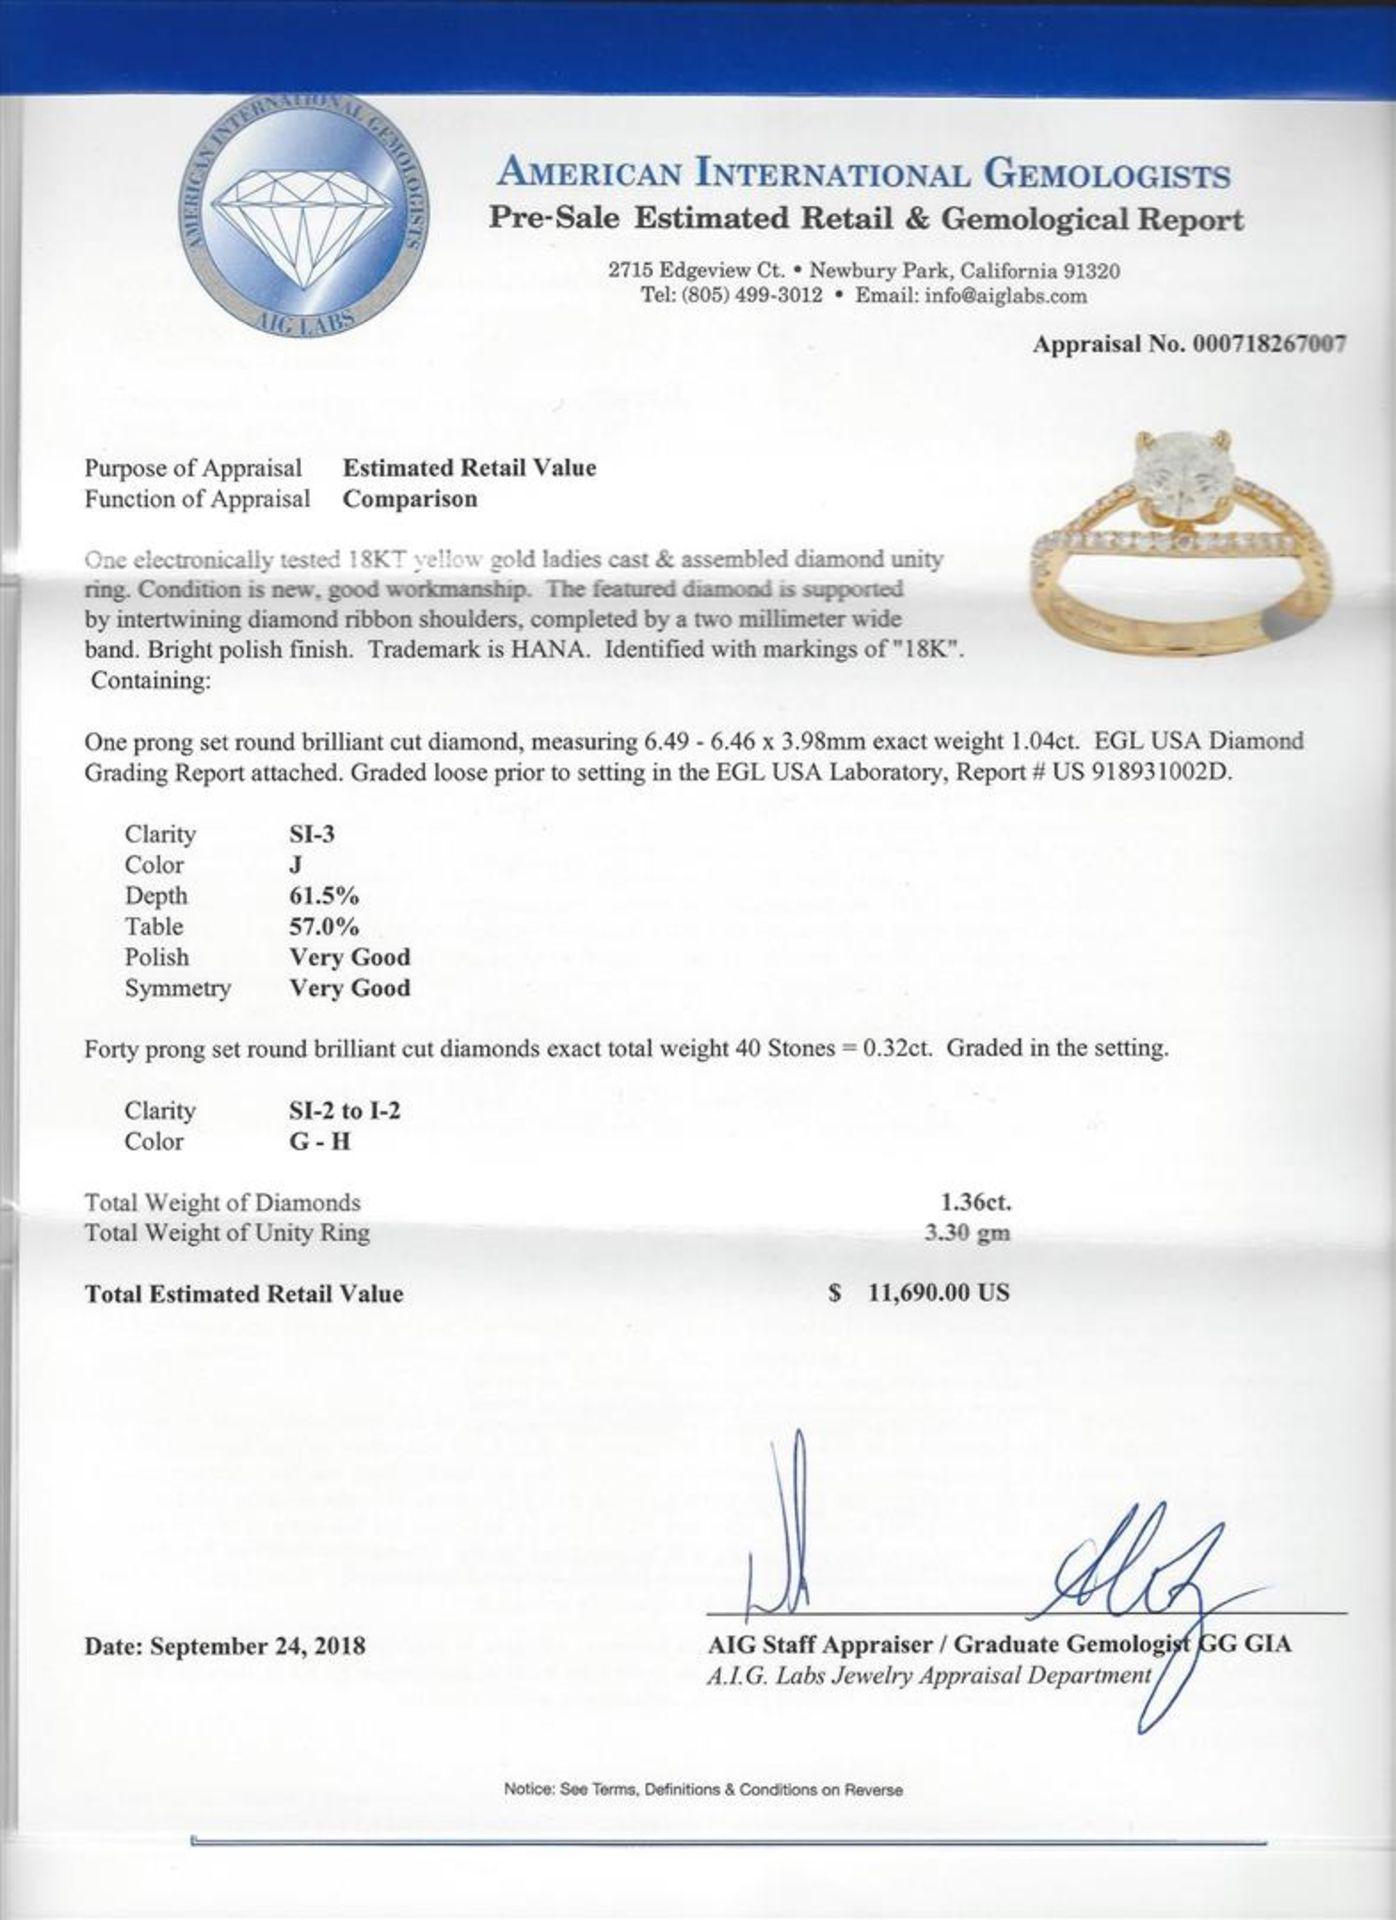 1.04ct Diamond Ring - 18KT Yellow Gold - Image 5 of 5